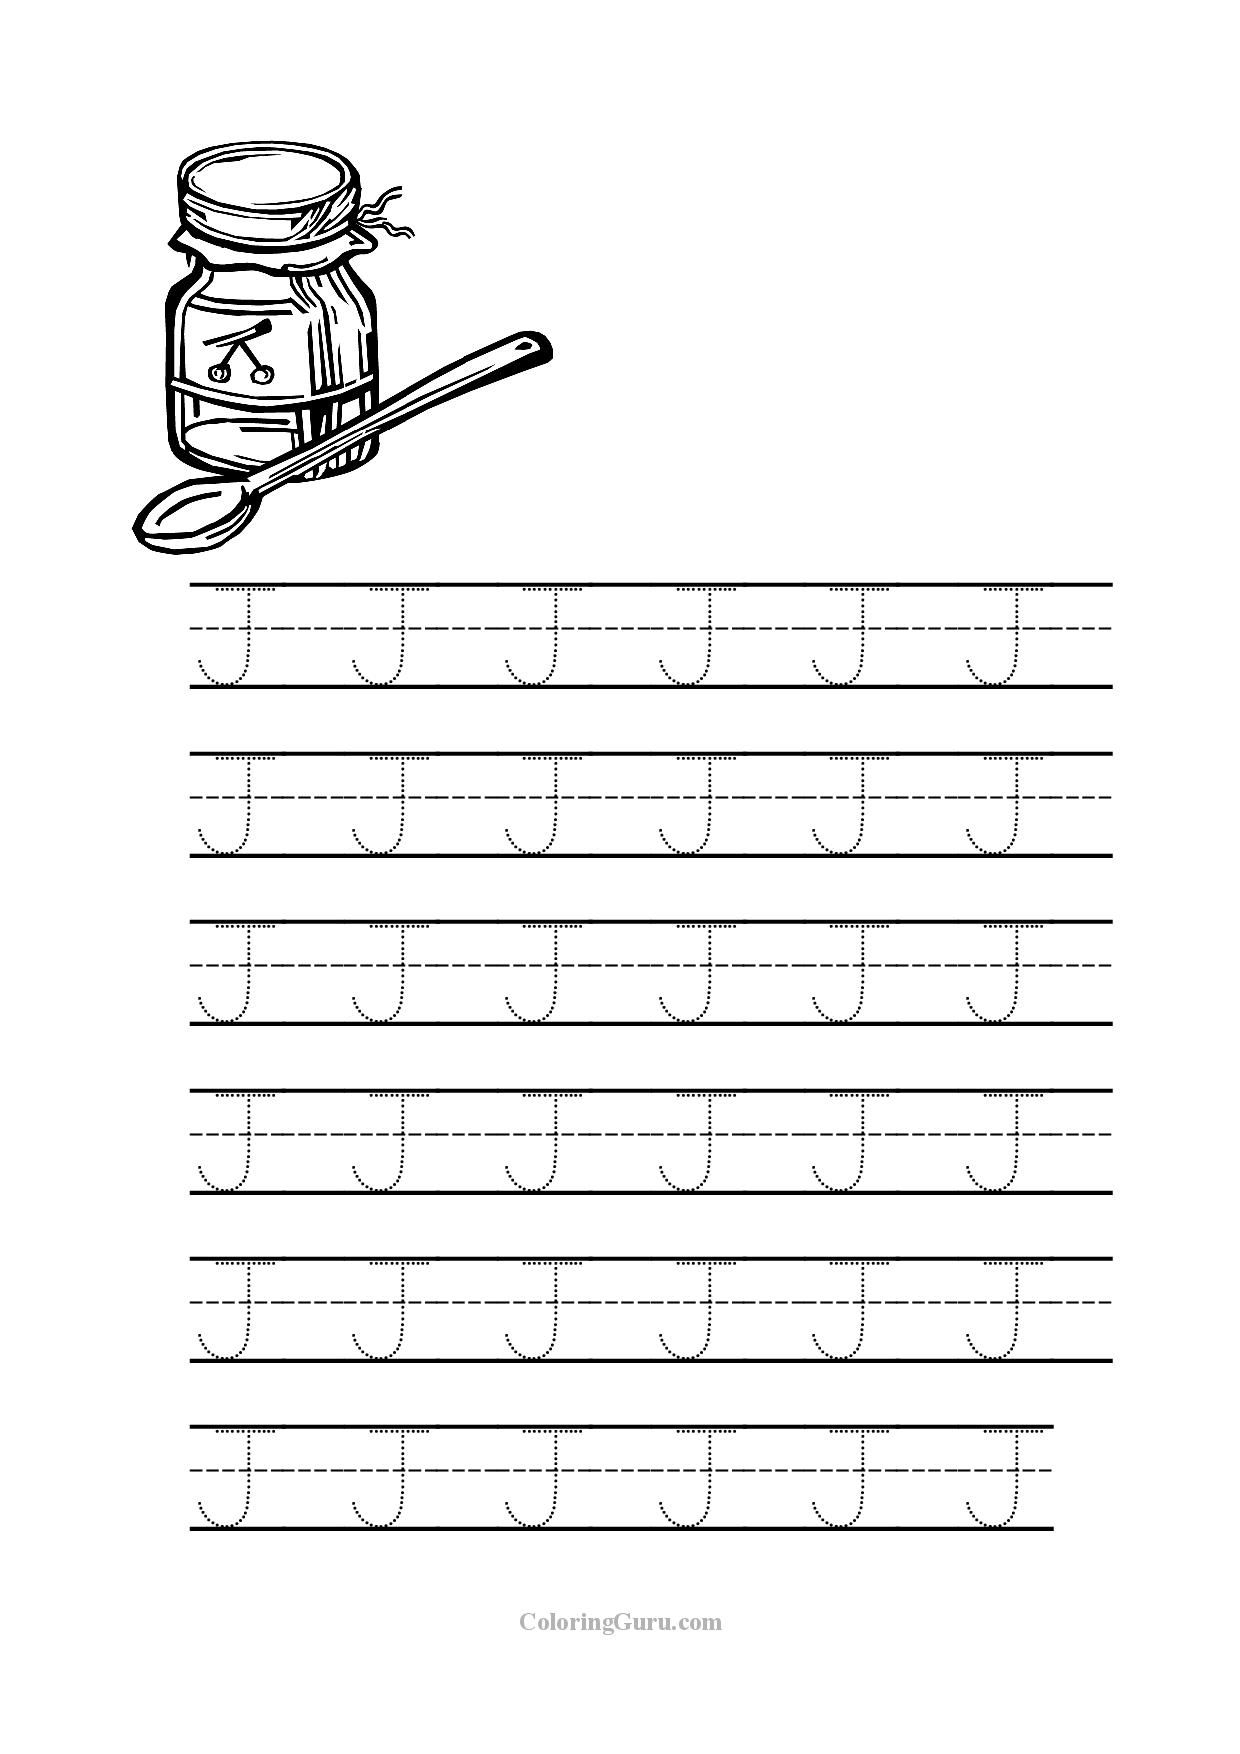 Free Printable Tracing Letter J Worksheets For Preschool intended for Letter J Worksheets Tracing